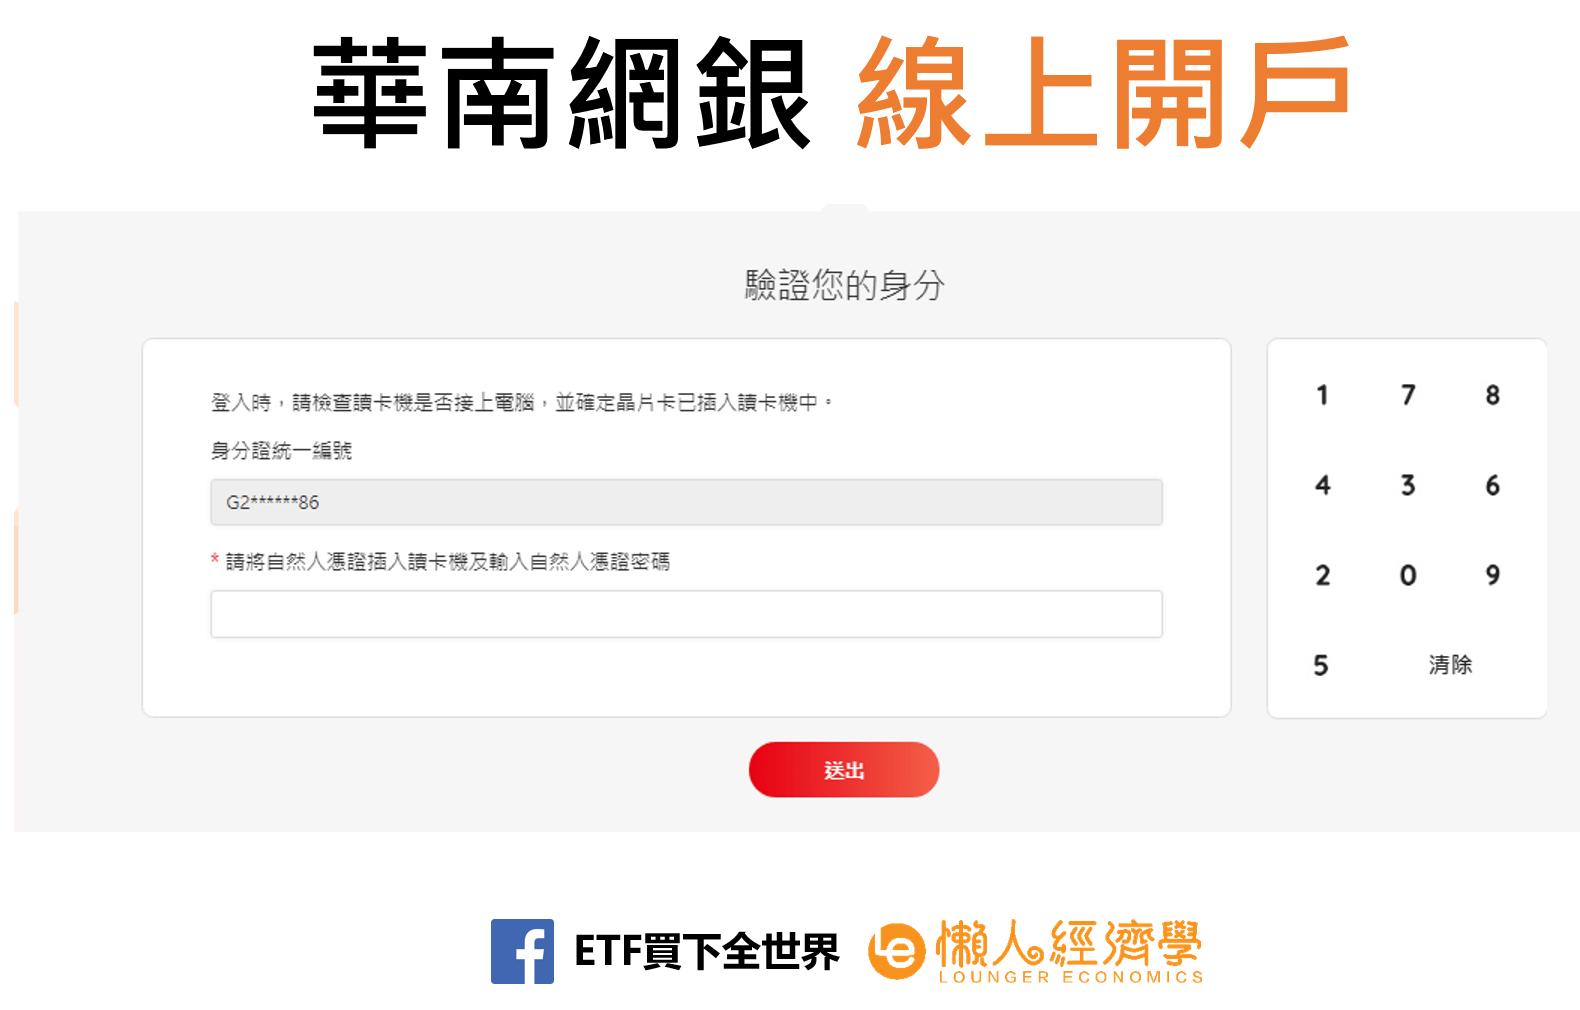 華南 SnY 帳戶介紹